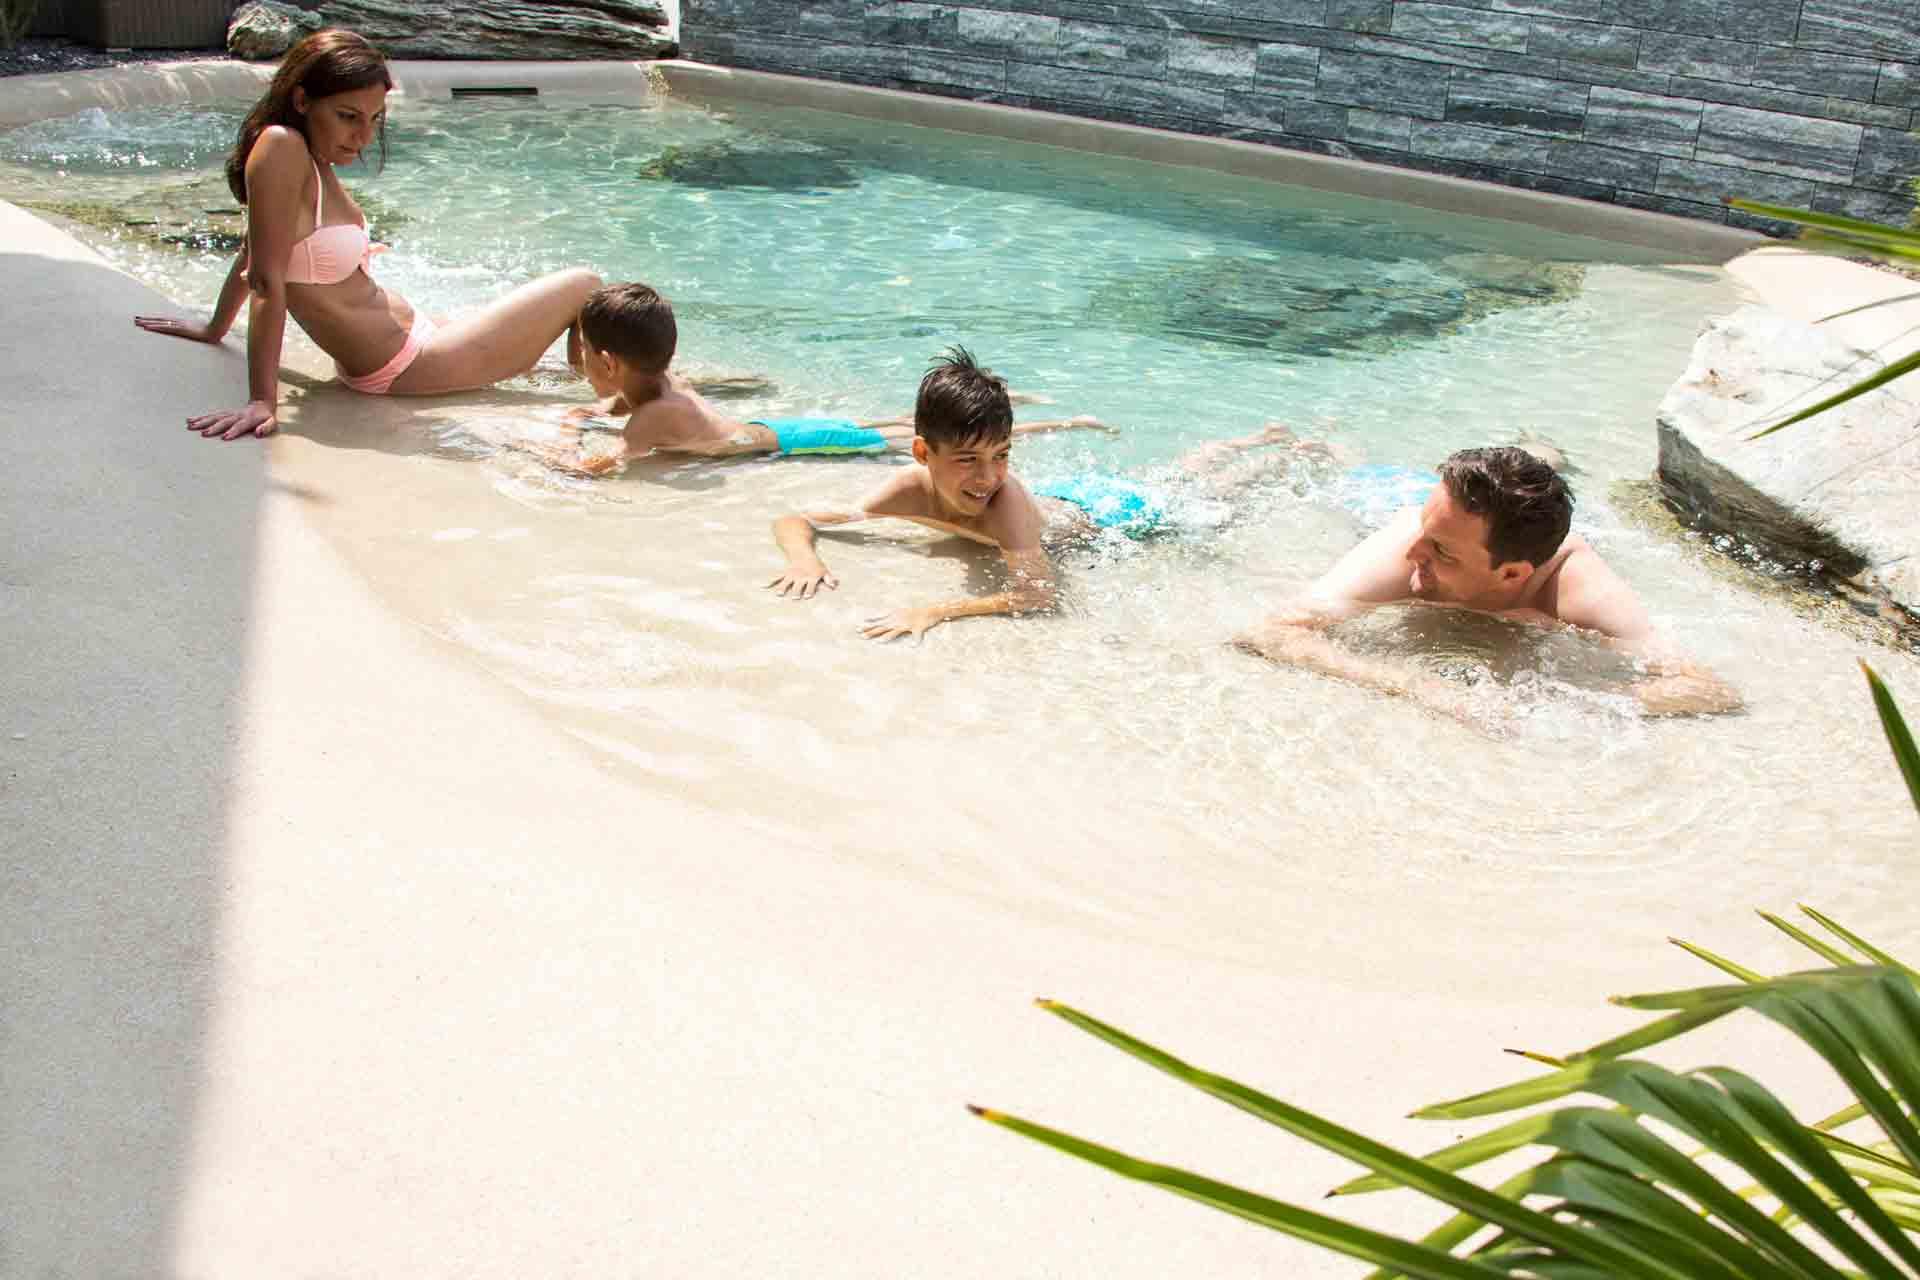 Poolbau Bonn - Individuellen Pool bauen lassen